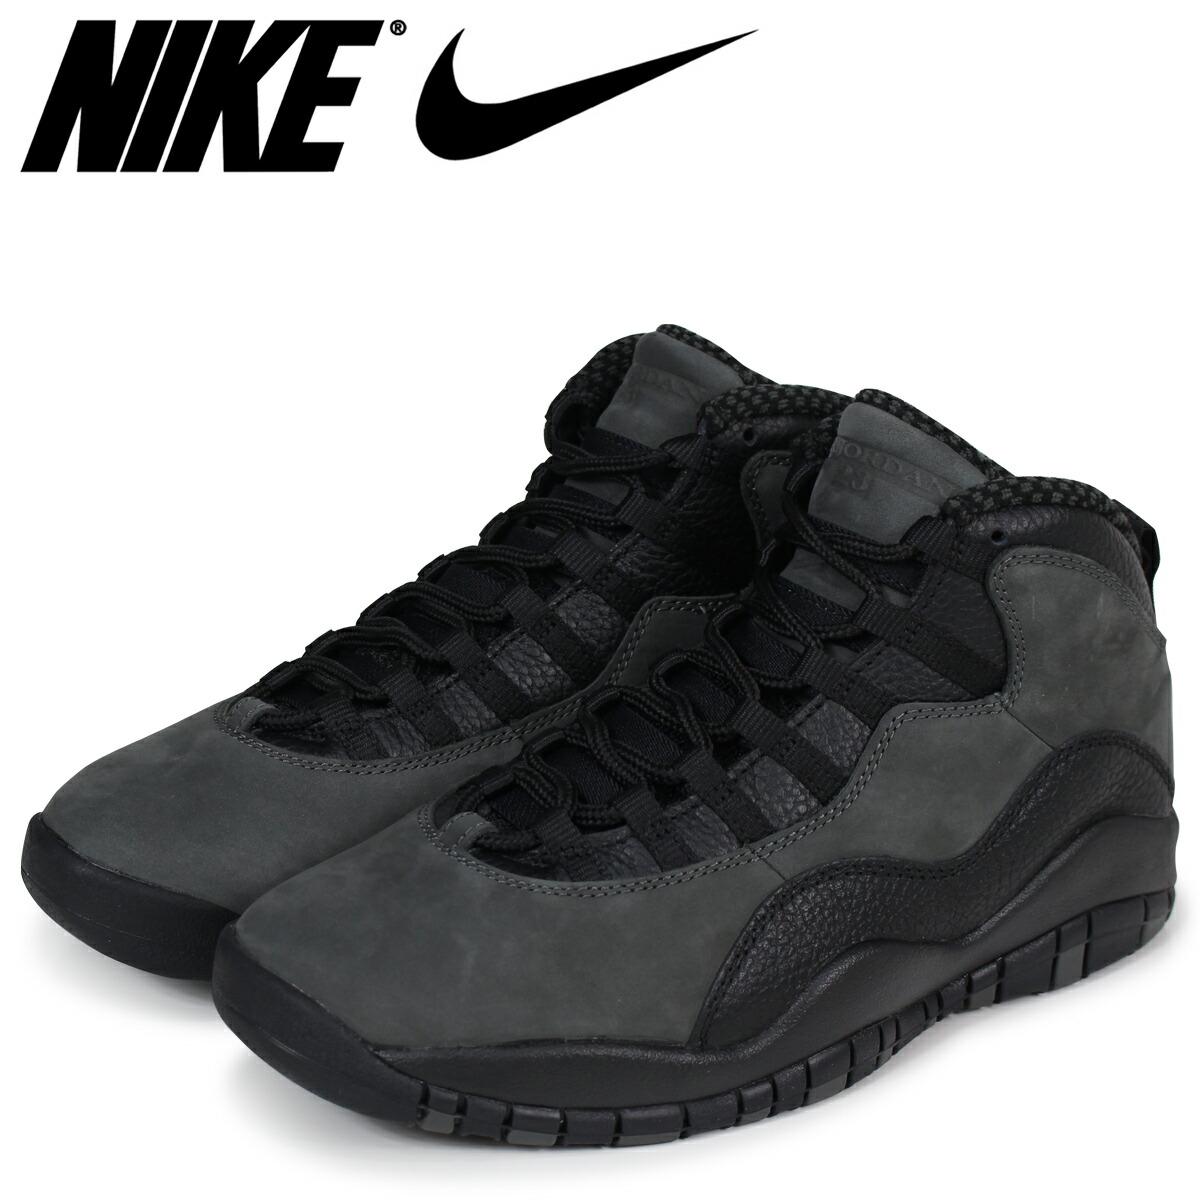 the latest dd9f8 7bbaf NIKE Nike Air Jordan 10 nostalgic sneakers men AIR JORDAN 10 RETRO  310,805-002 gray gray  load planned Shinnyu load in reservation product 5 2  containing